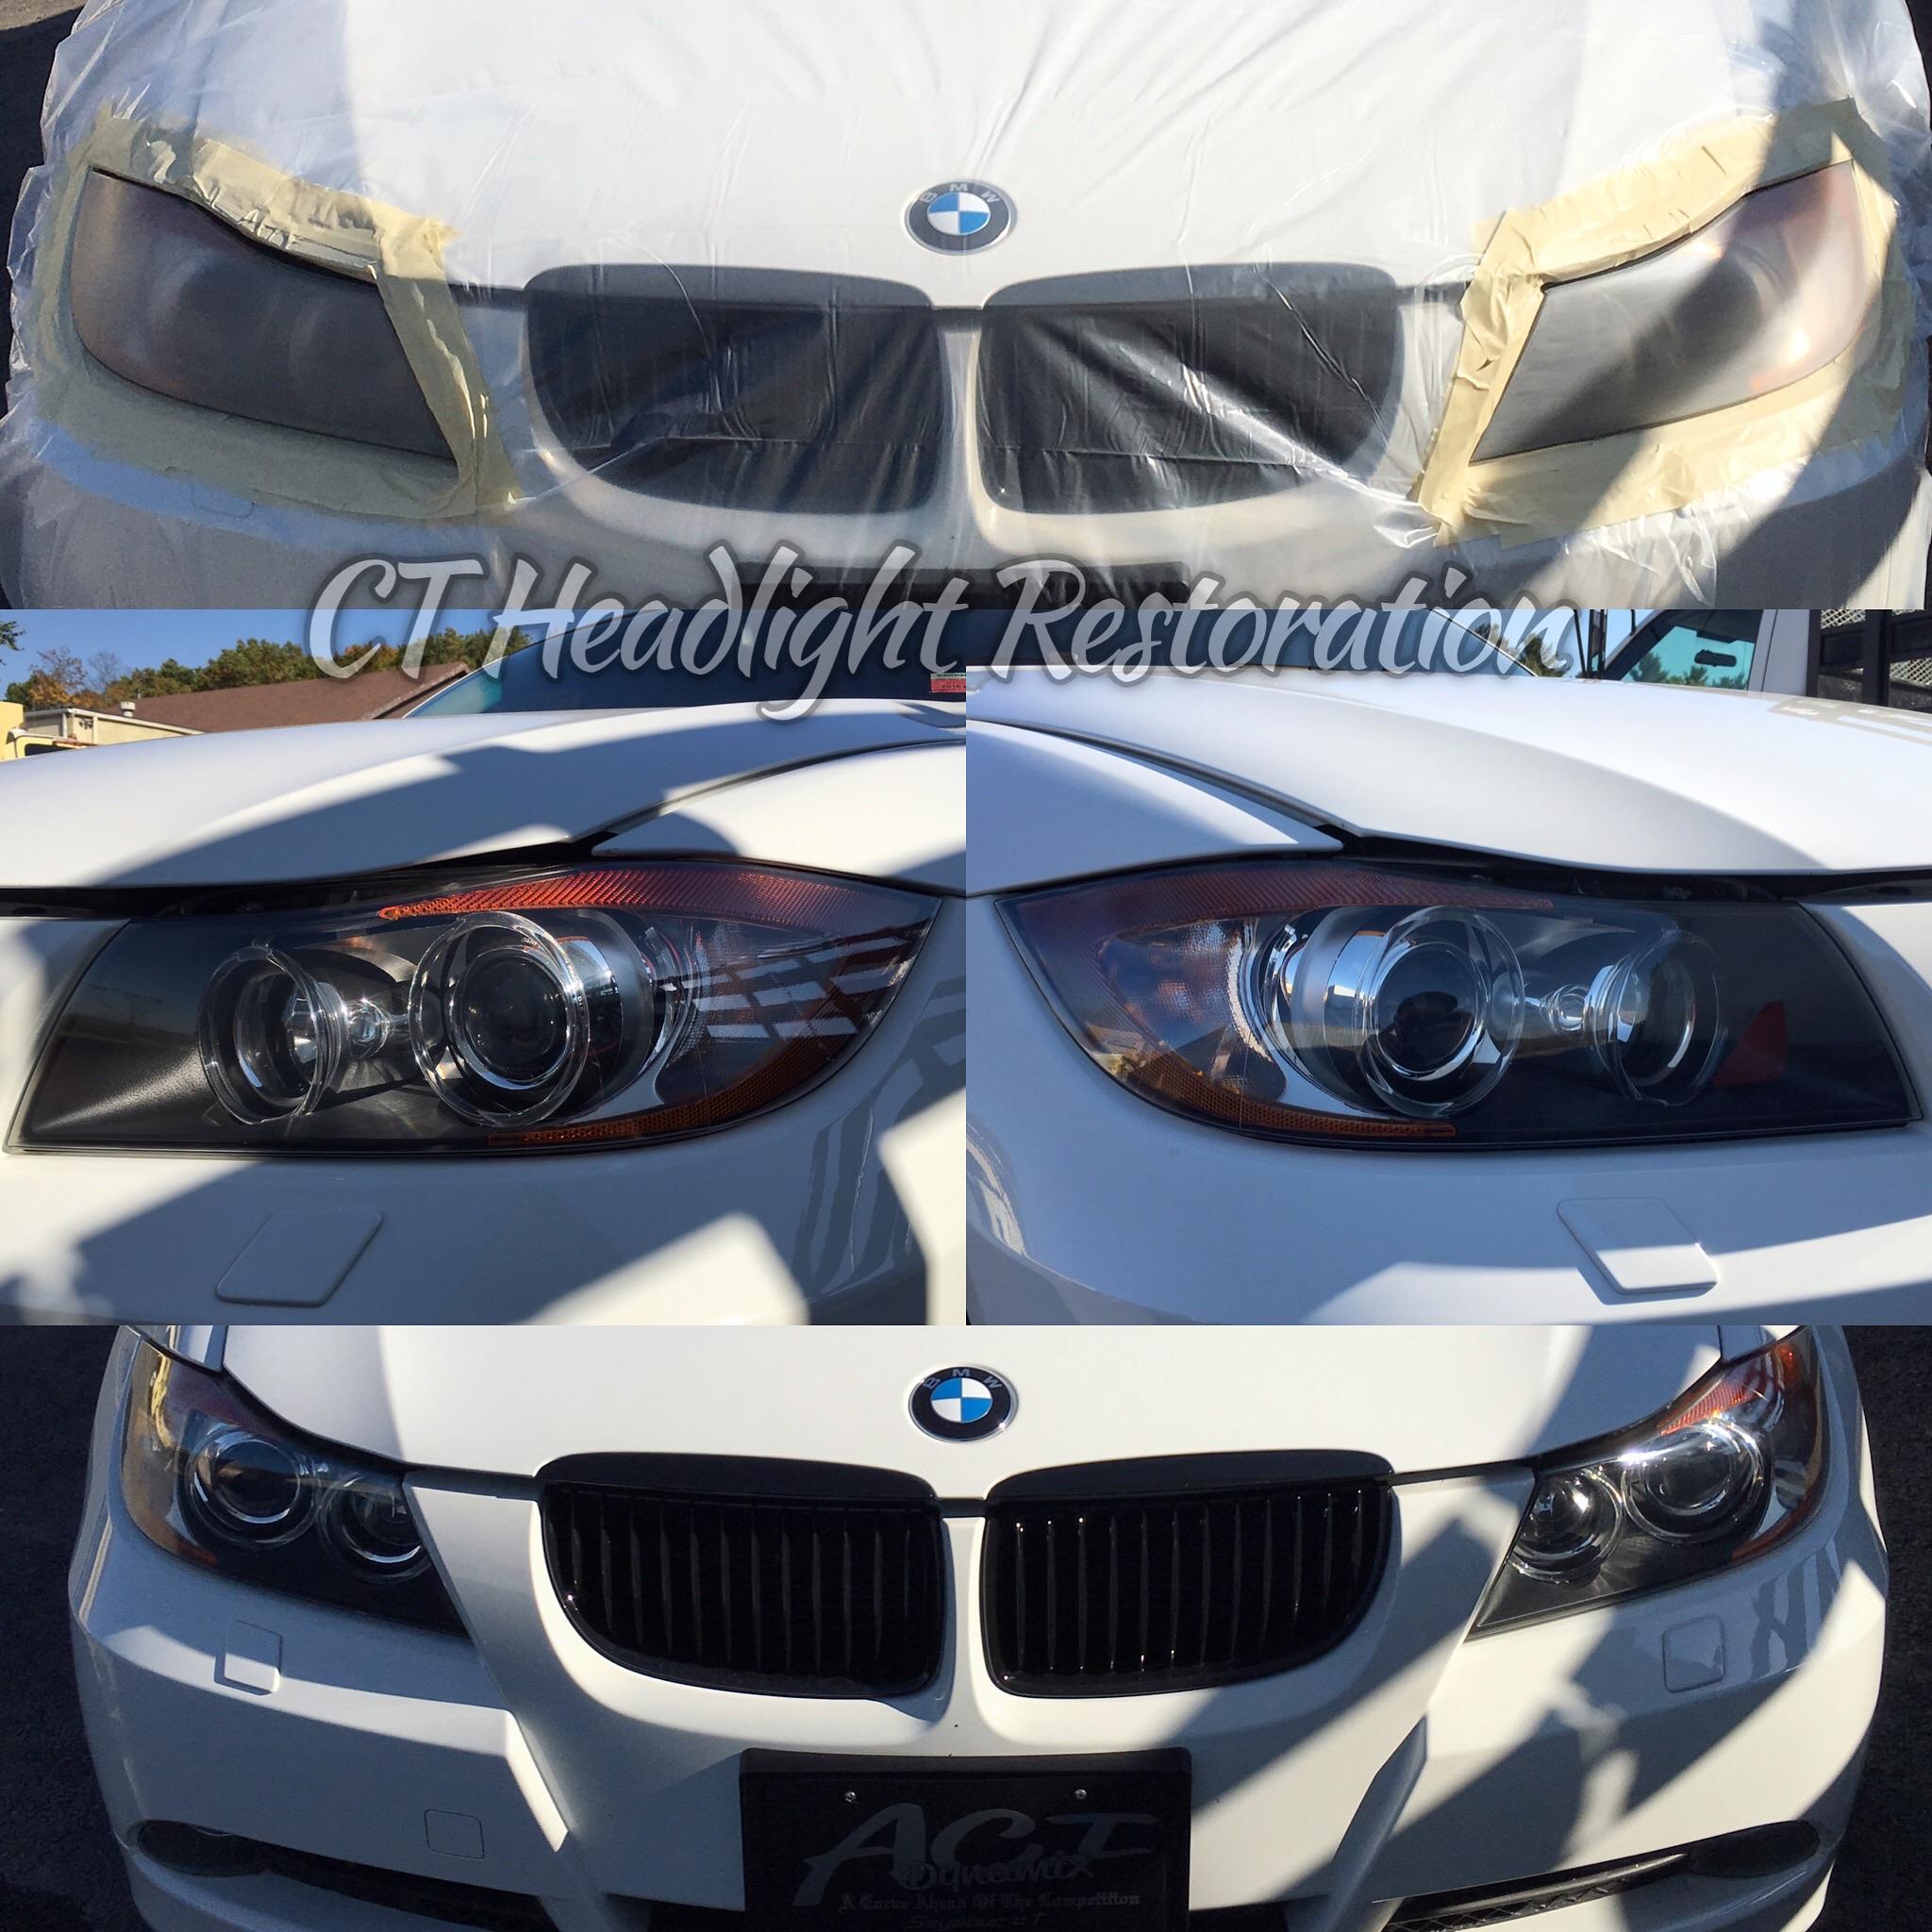 BMW 335 Connecticut Headlight Restoration.jpg